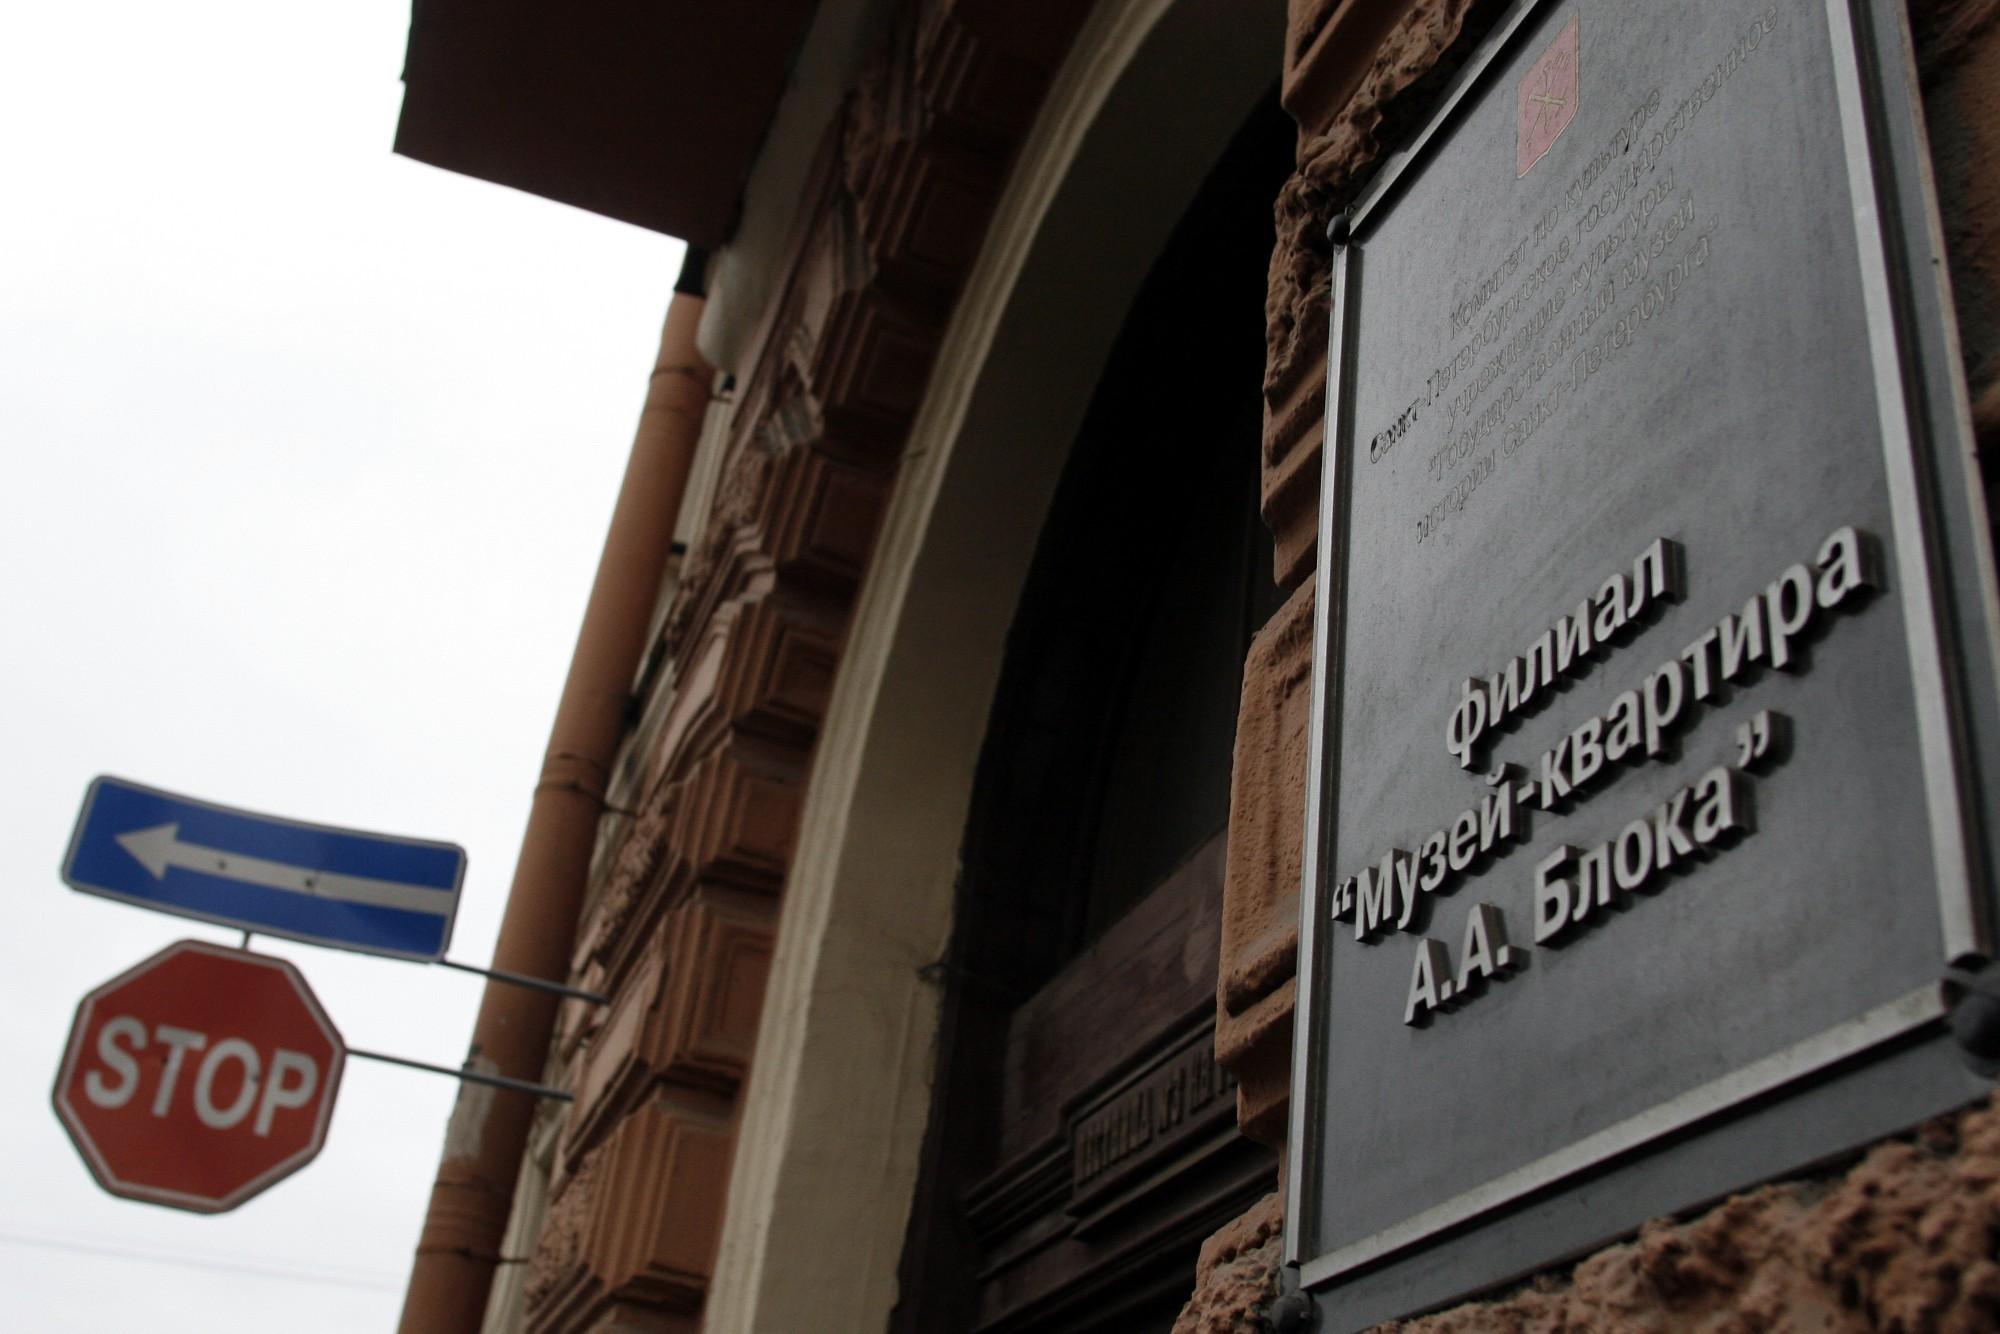 Музей-квартира Александра Блока улица Декабристов 57